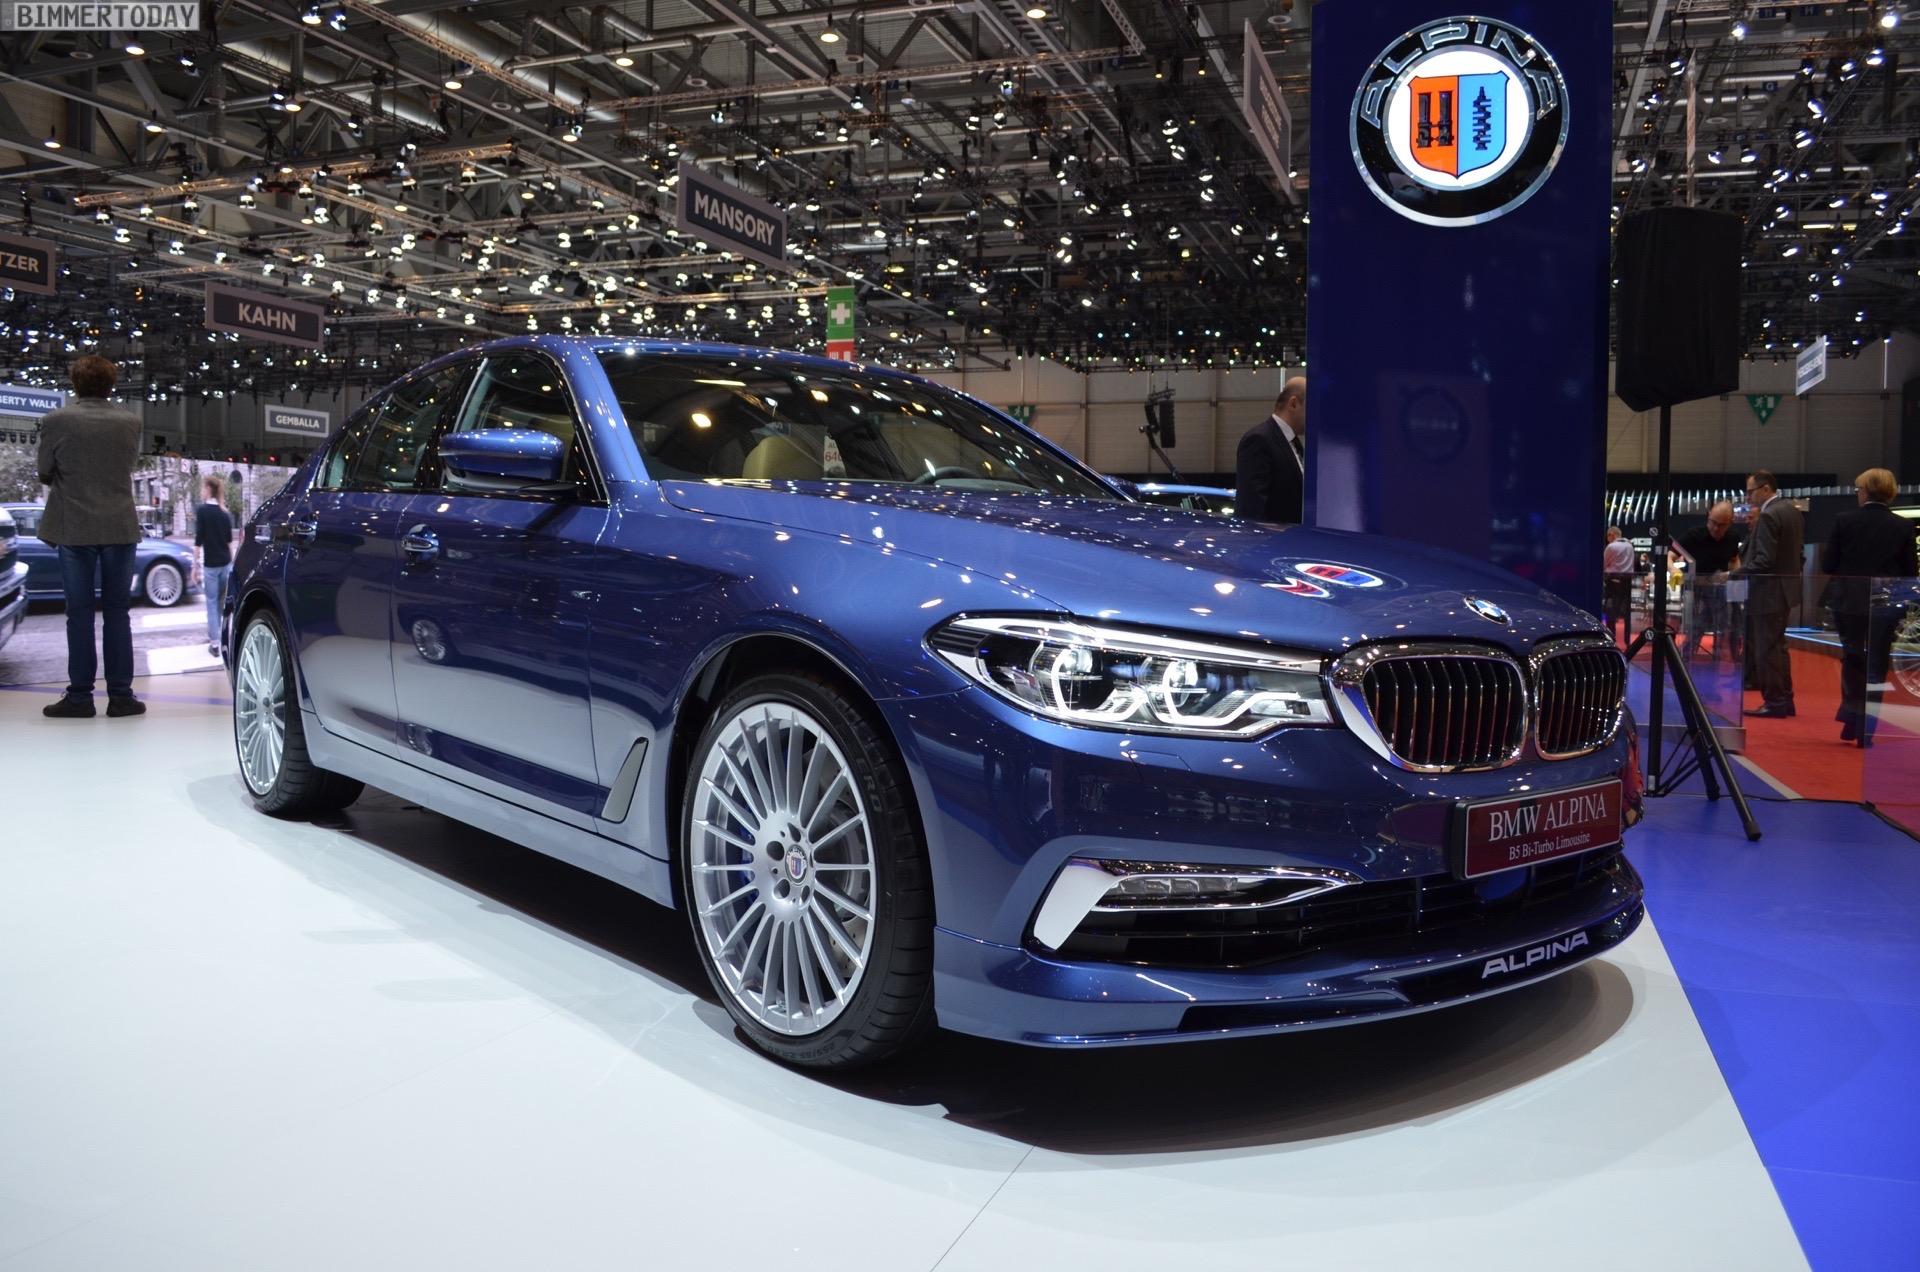 2017 BMW Alpina B5 G30 5er Limousine Genf Autosalon Live 01